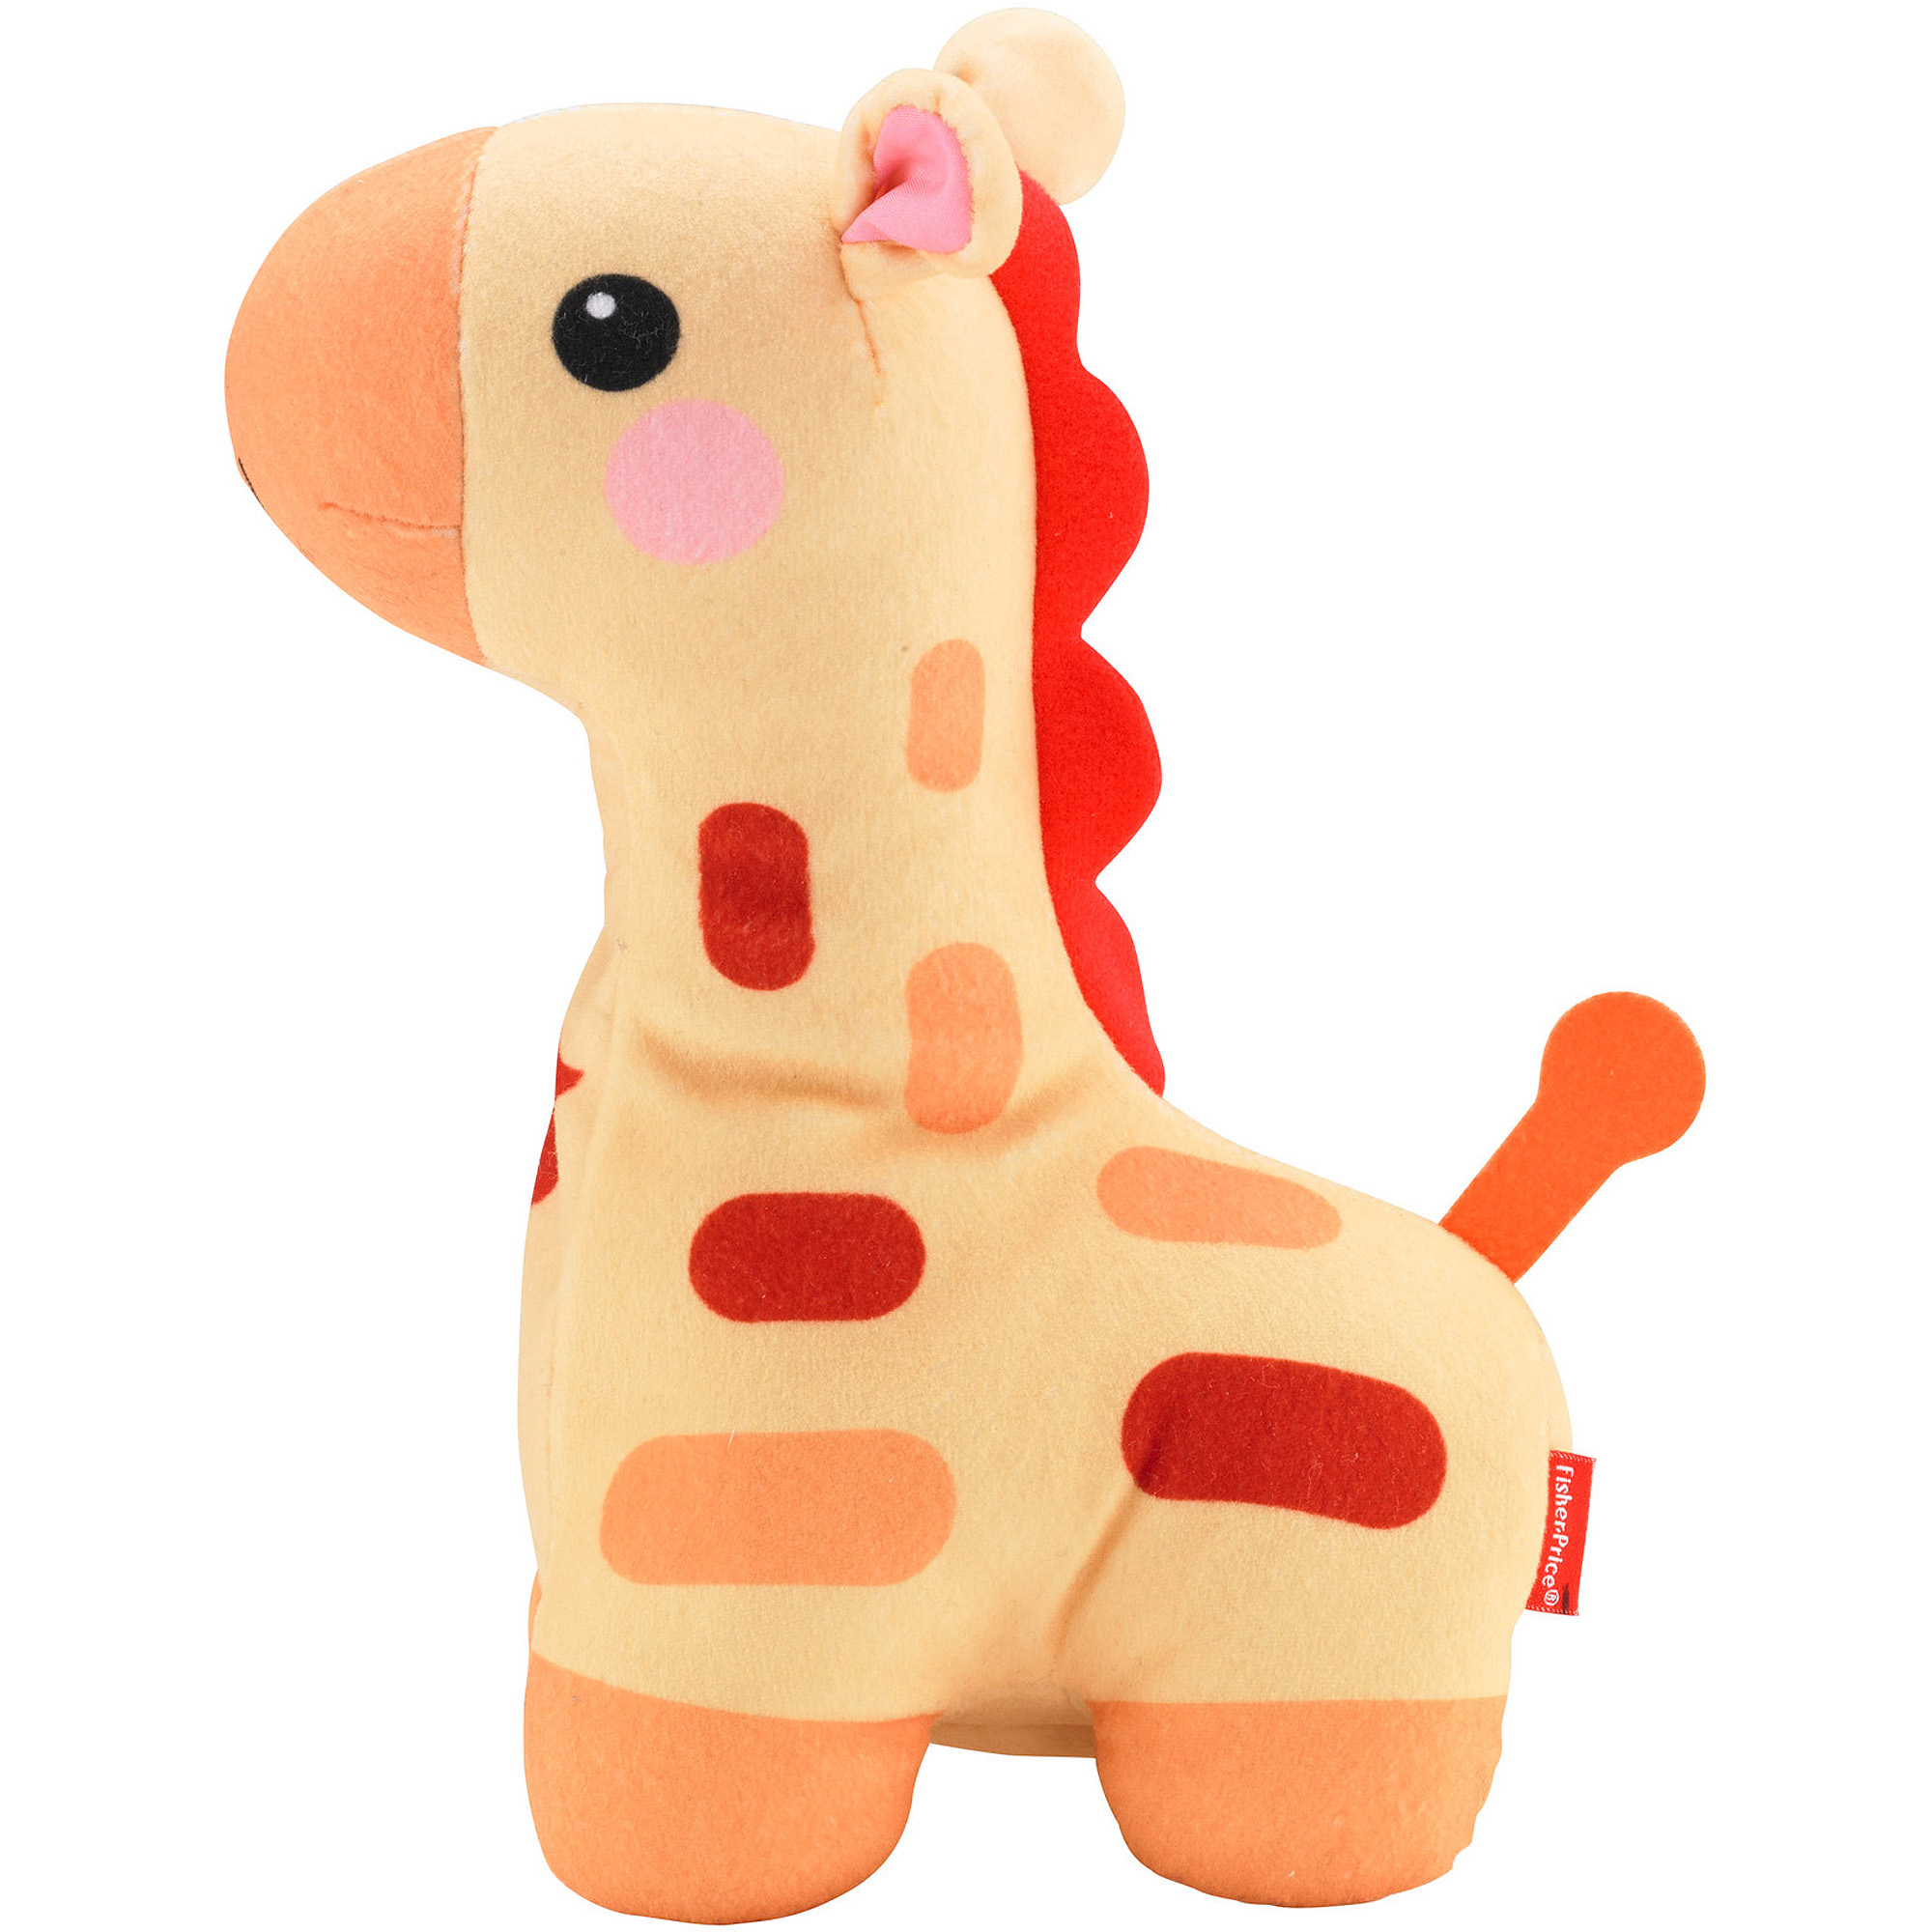 Fisher-Price Soothe & Glow Giraffe, Yellow